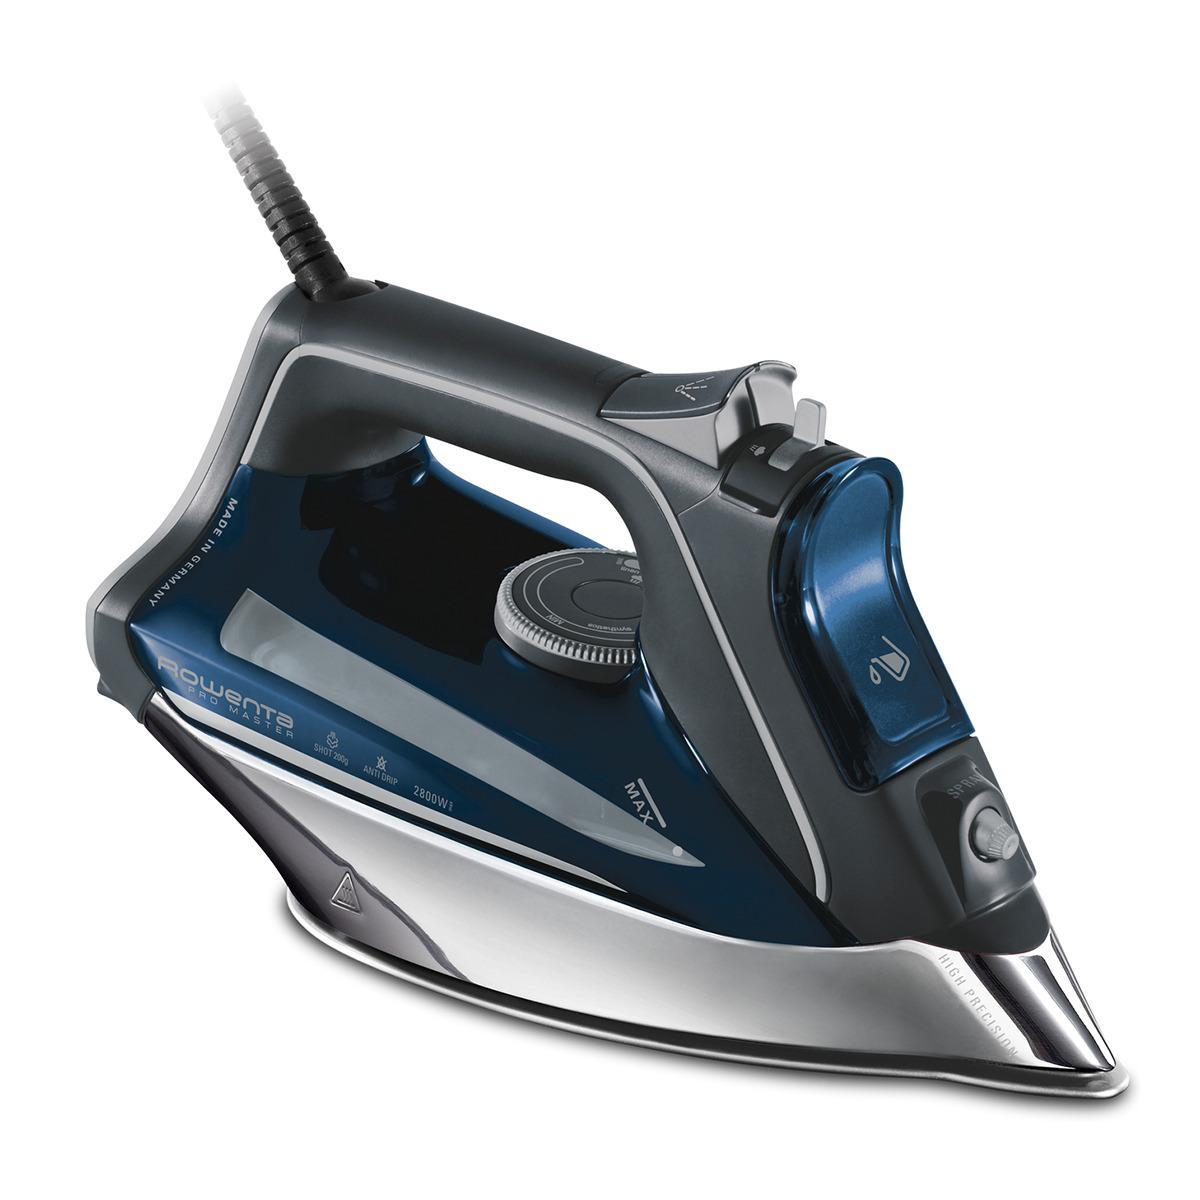 Rowenta Rowenta DW8221 Fer à repasser Pro Master 2800W Gris/Bleu